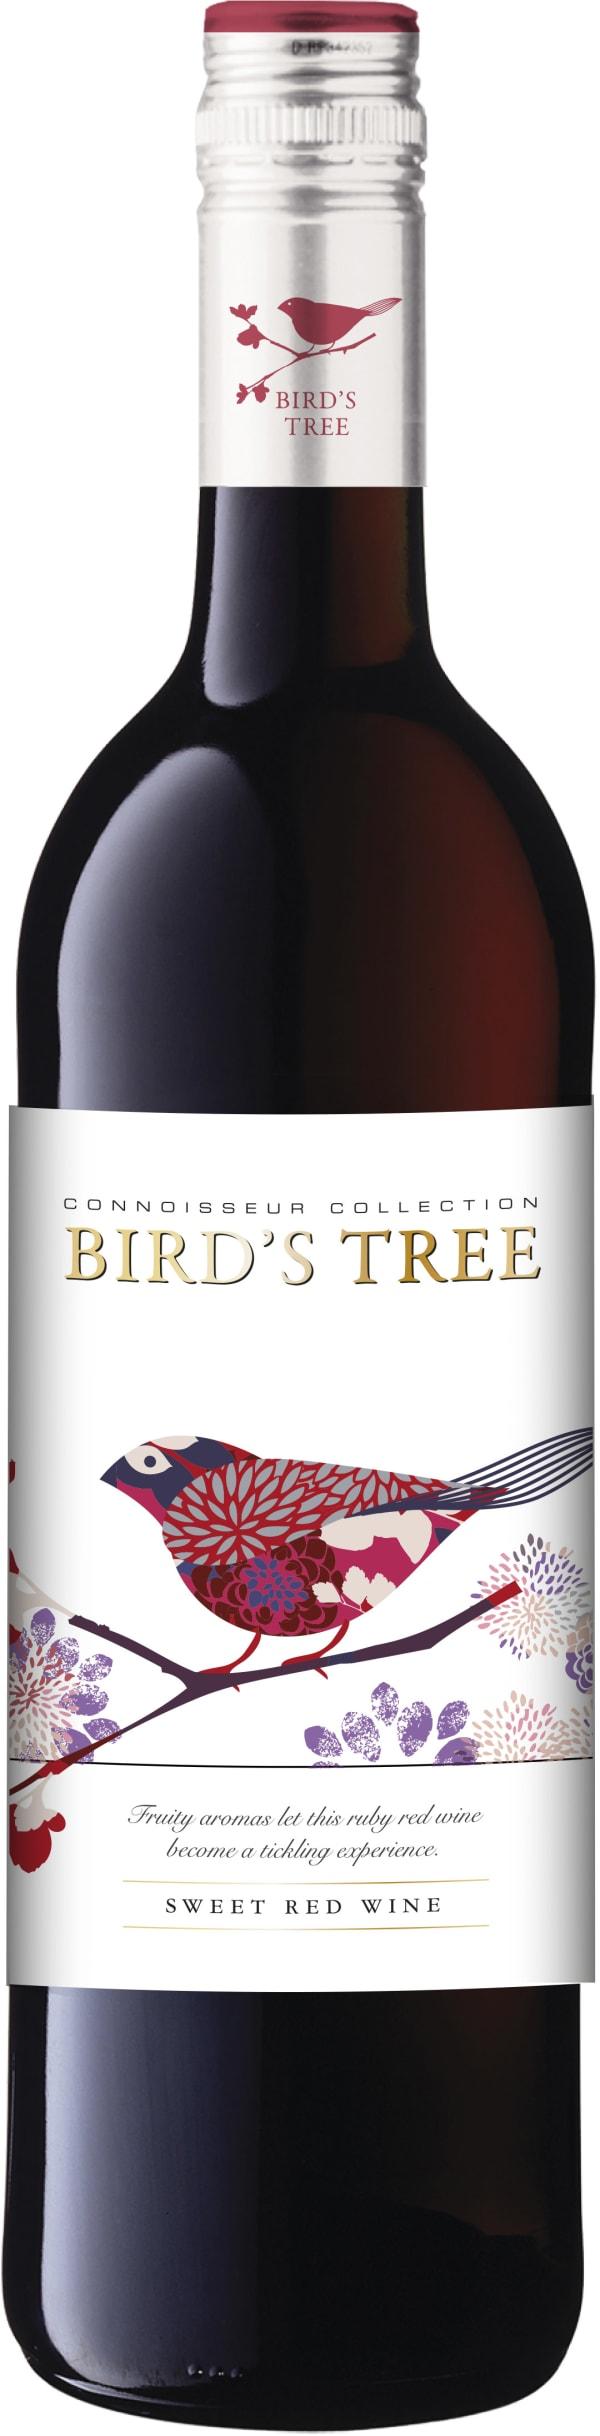 Bird's Tree Red 2018